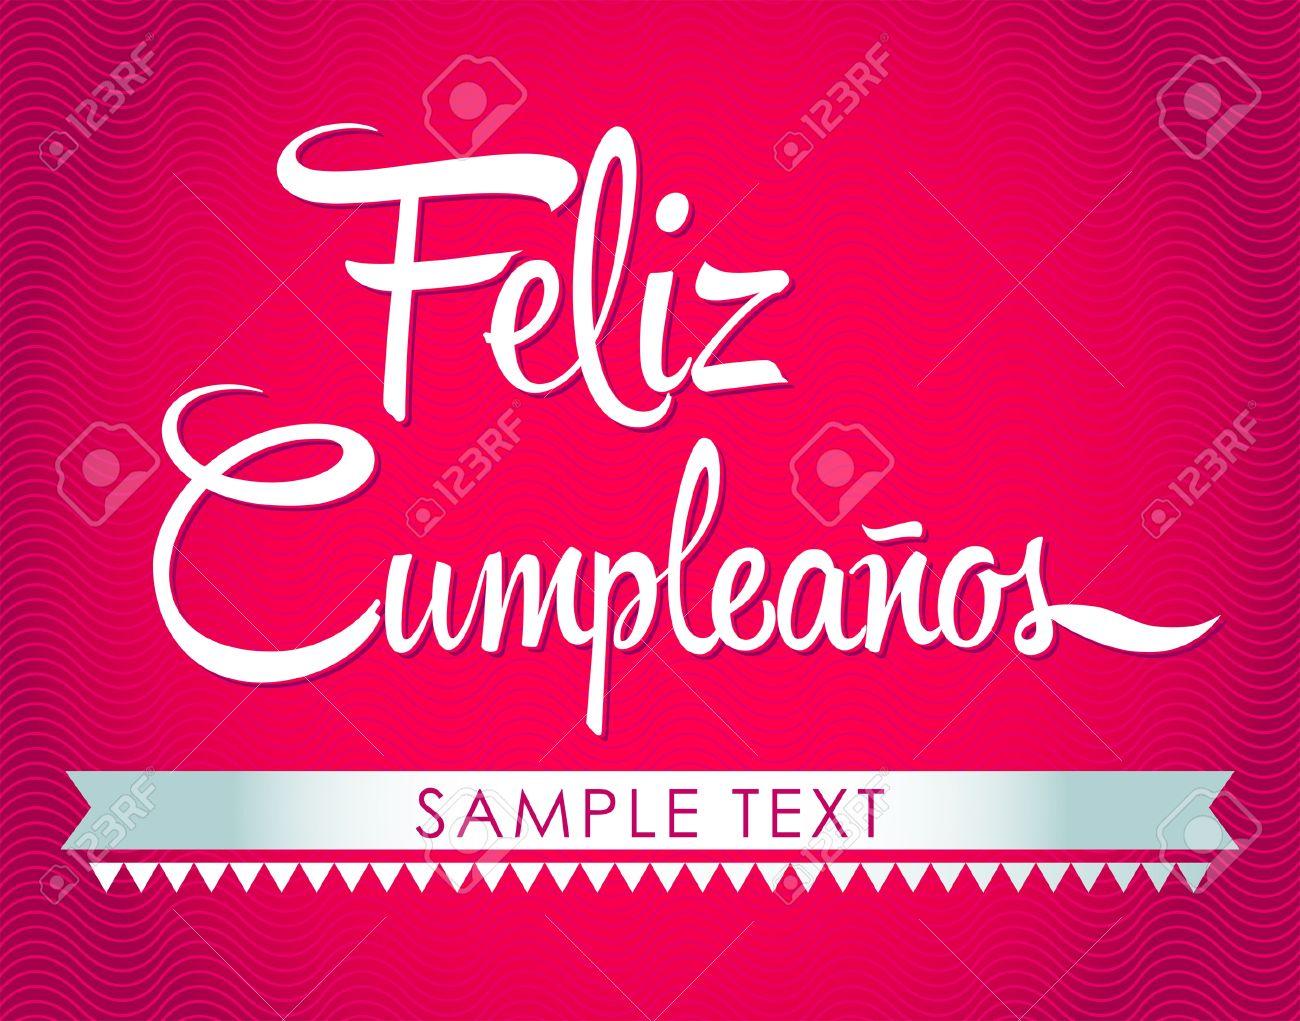 Feliz Cumpleanos Happy Birthday Spanish Text Vector Lettering